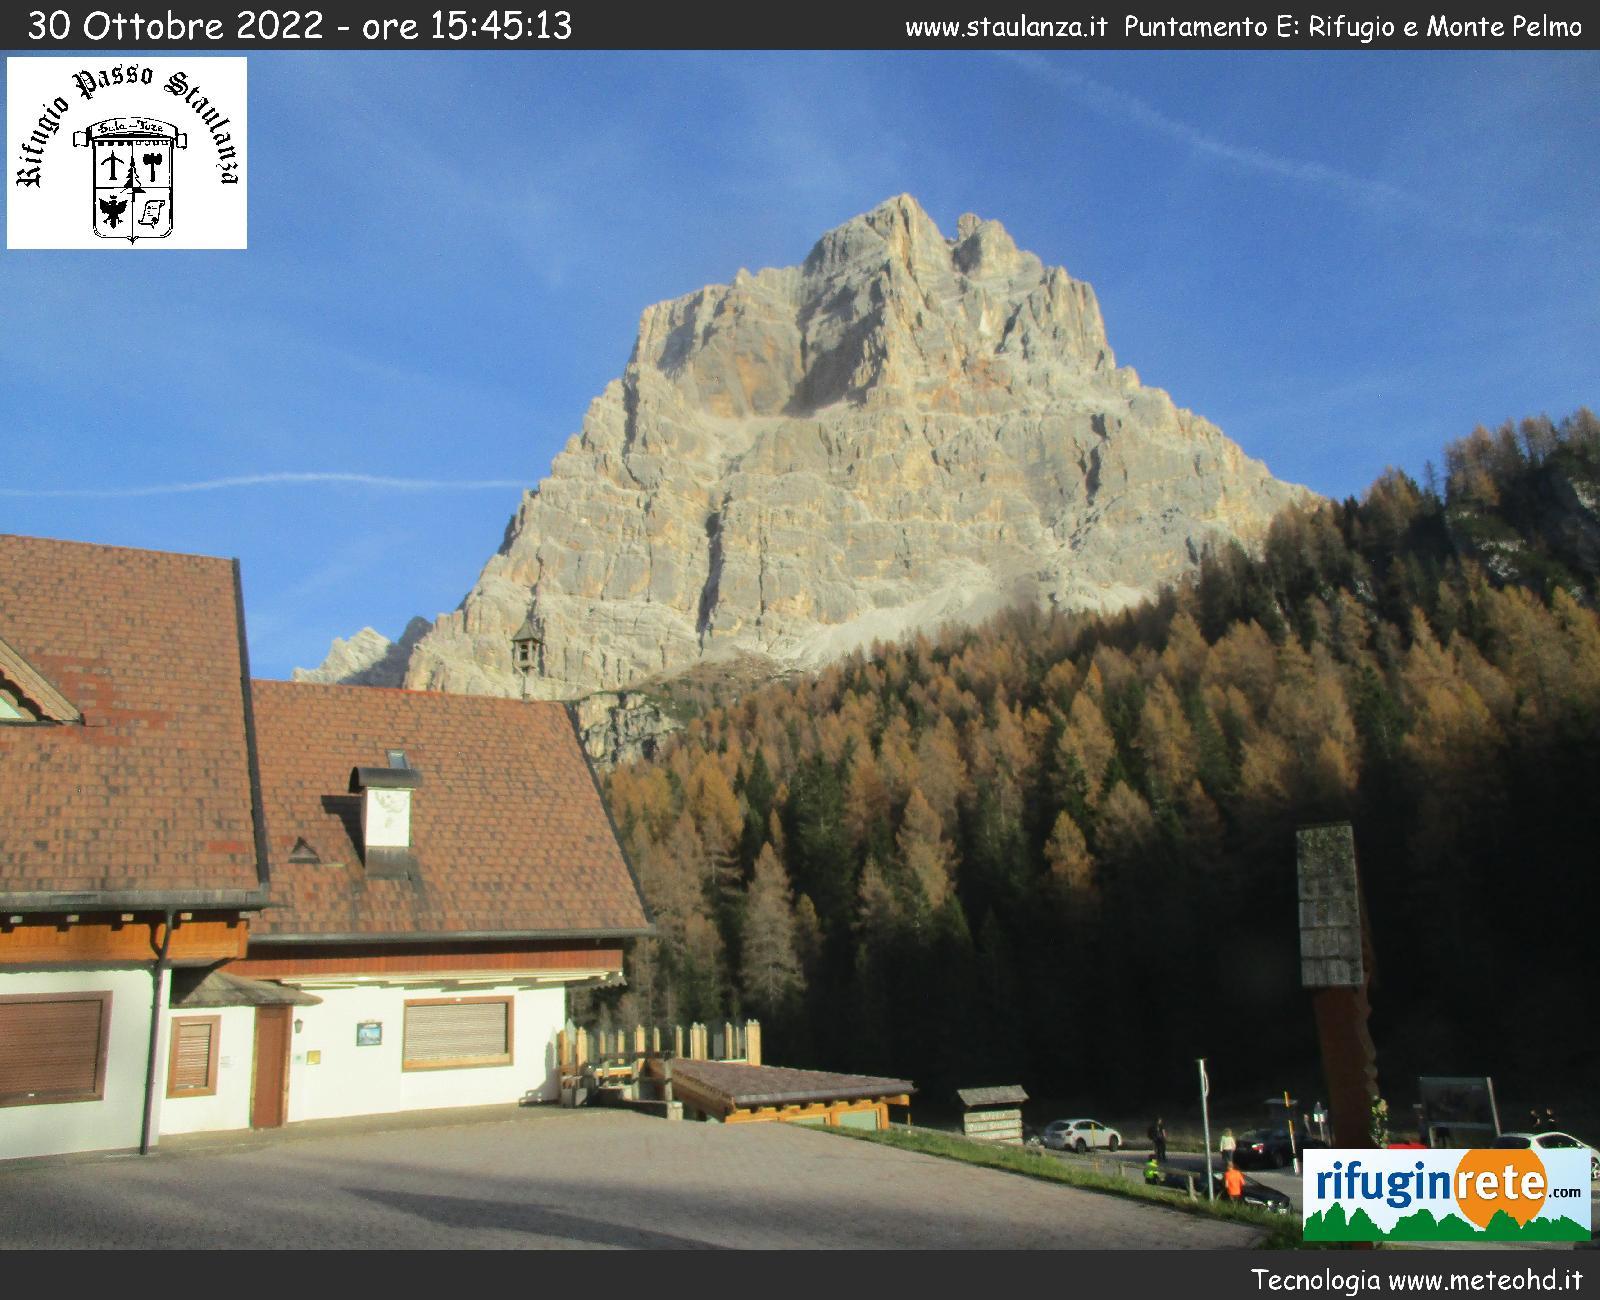 webcam zoldo rifugio passo staulanza